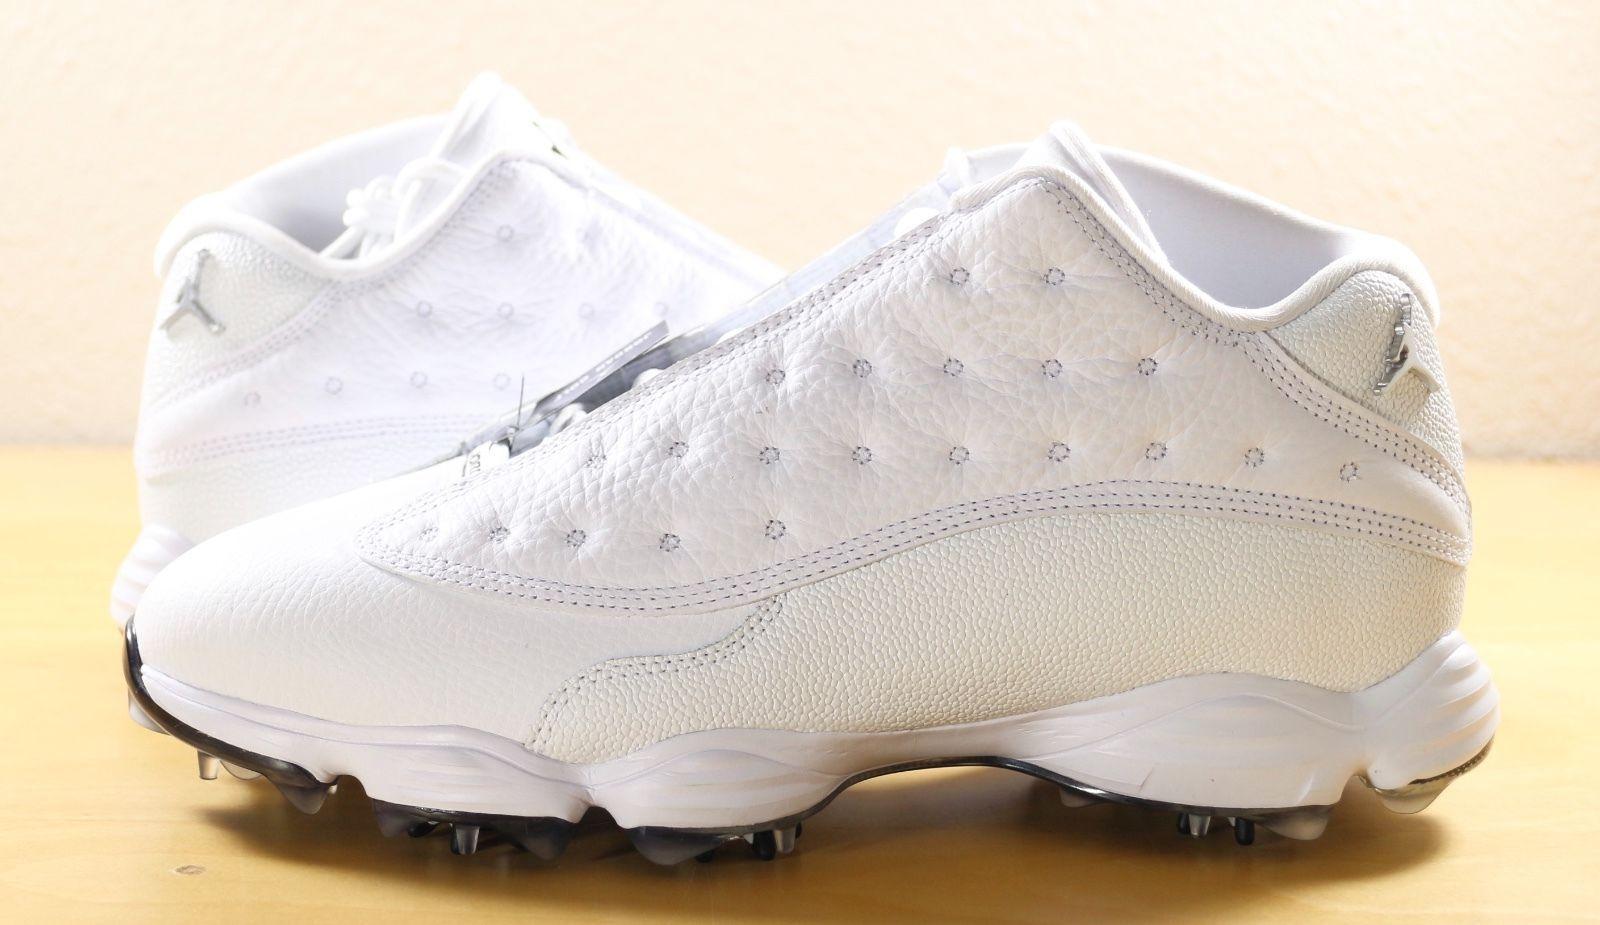 2532bd2de17 Nike Air Jordan 13 XIII Retro Low Golf Shoes Cleats White Black 917719-102  9.5